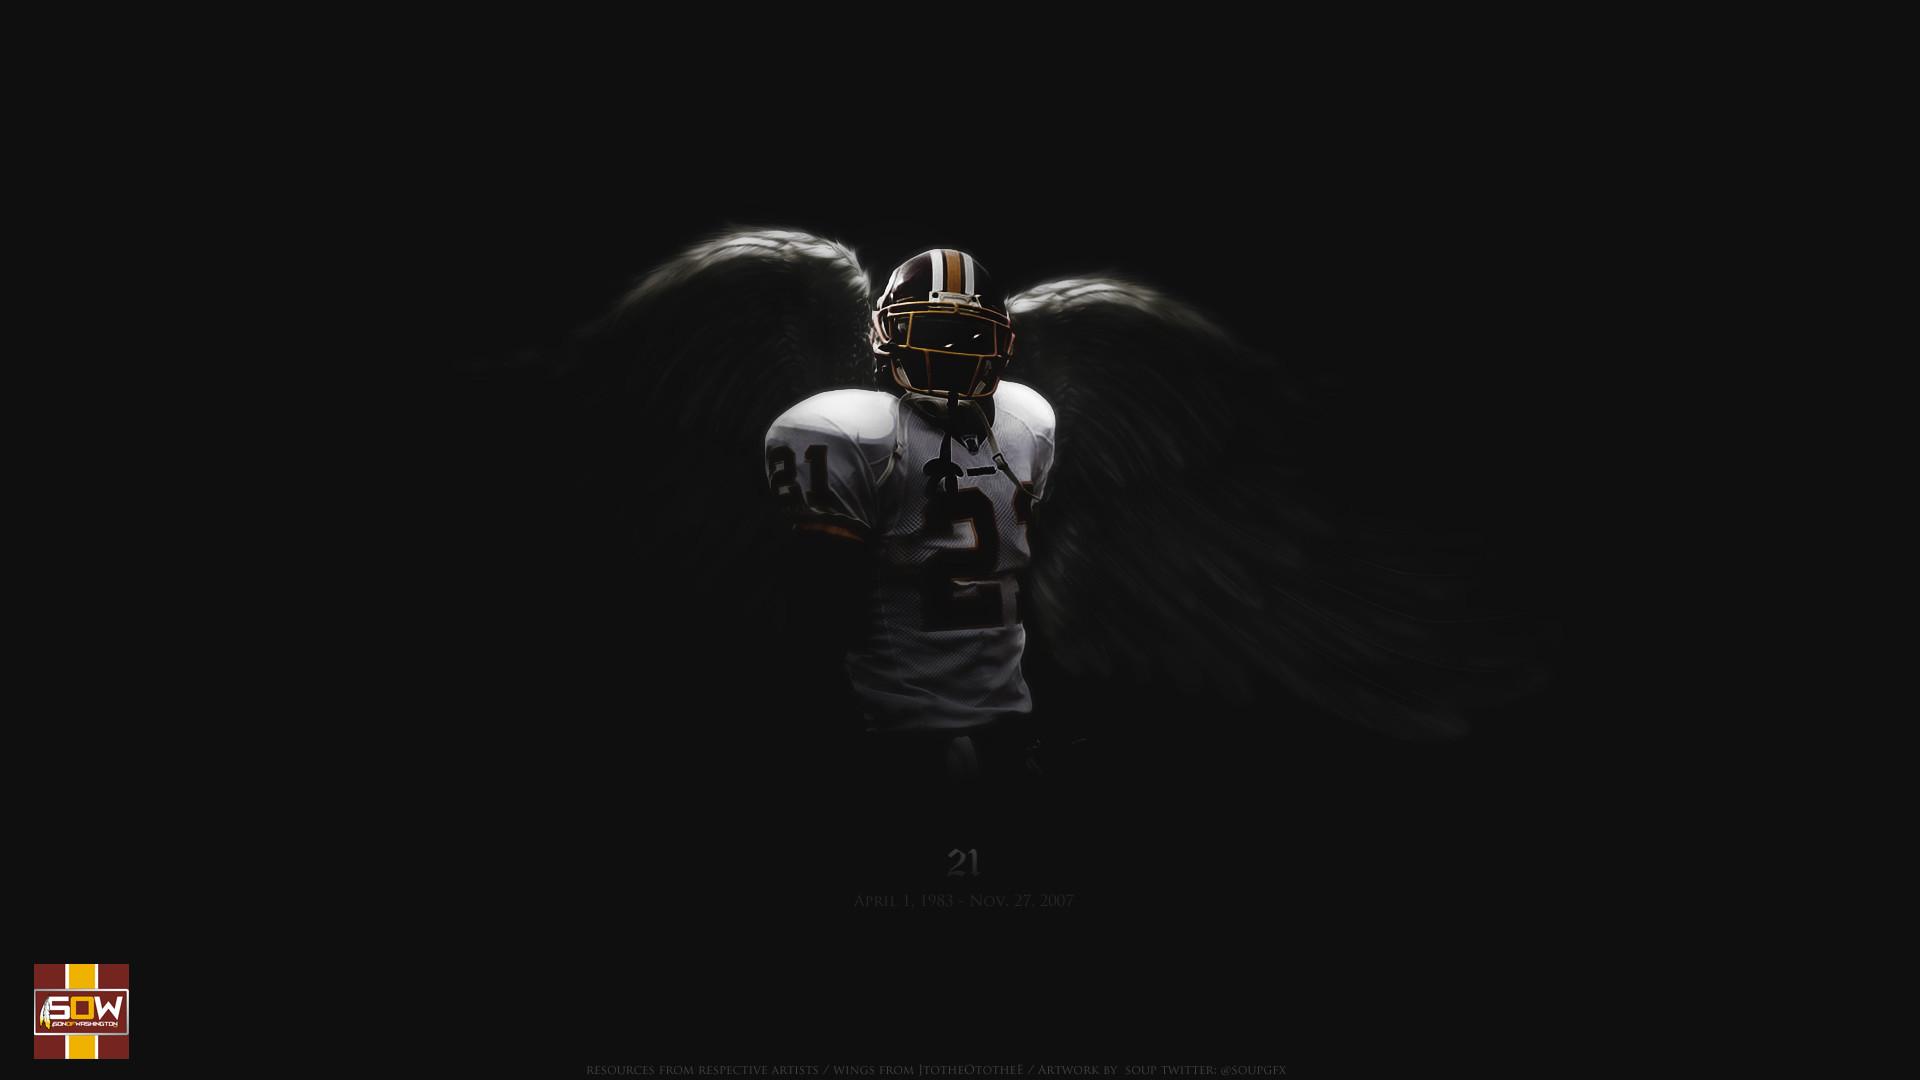 Redskins Wallpaper by SoxFan on DeviantArt Redskins Wallpaper